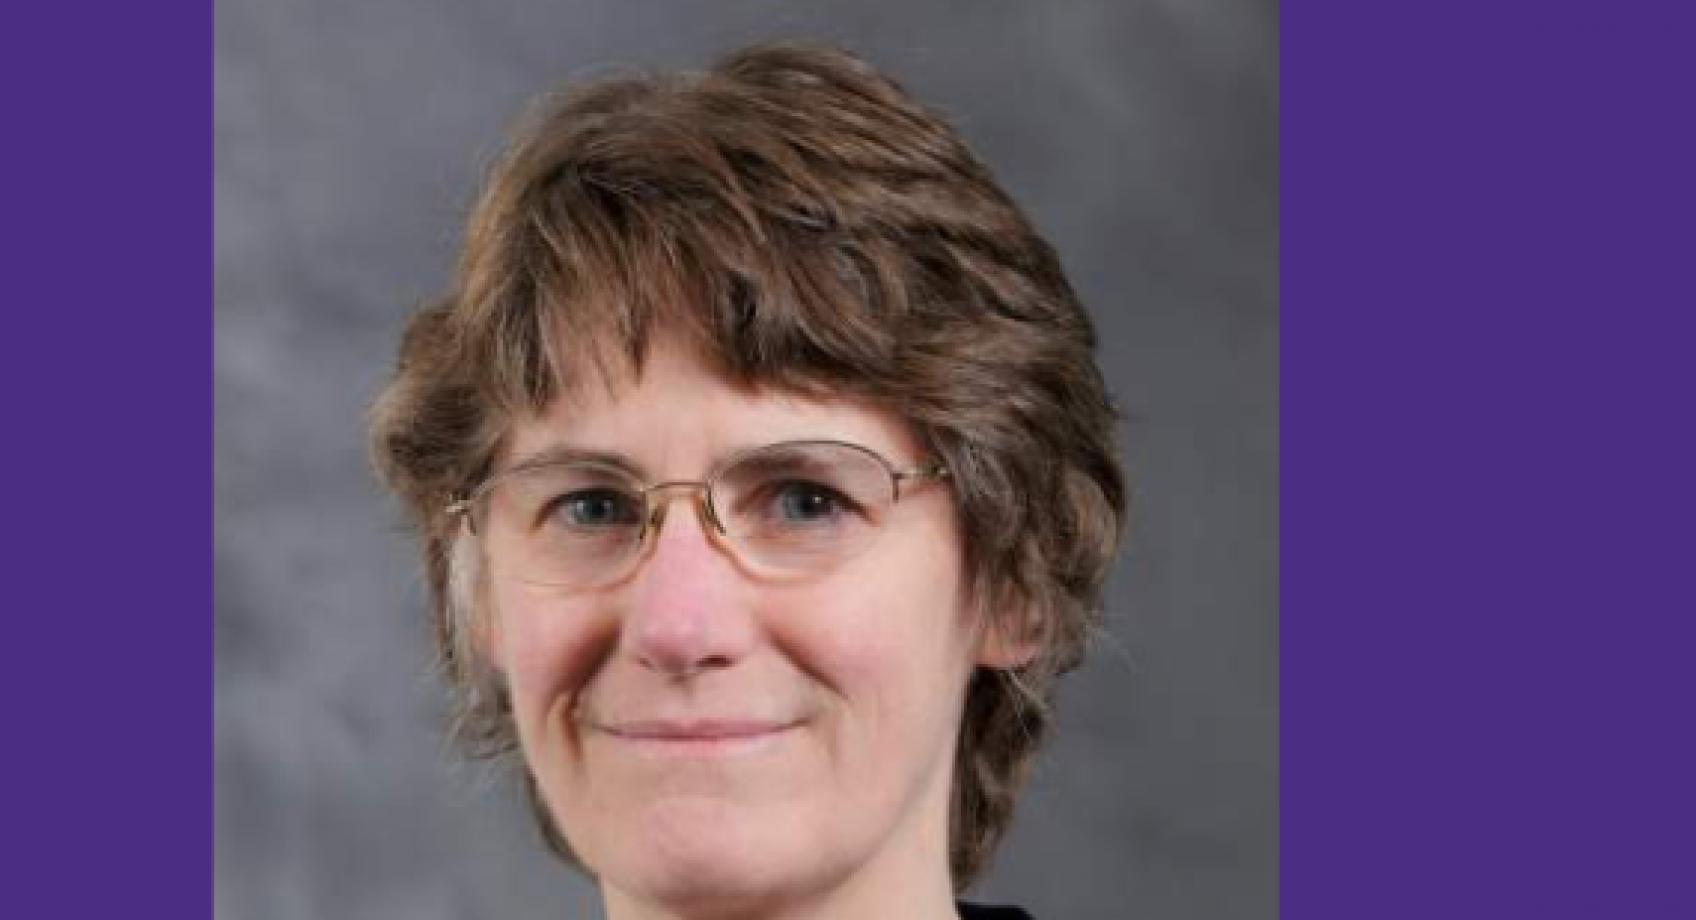 Fast Company magazine discusses ECE professor Mari Ostendorf's expertise Banner